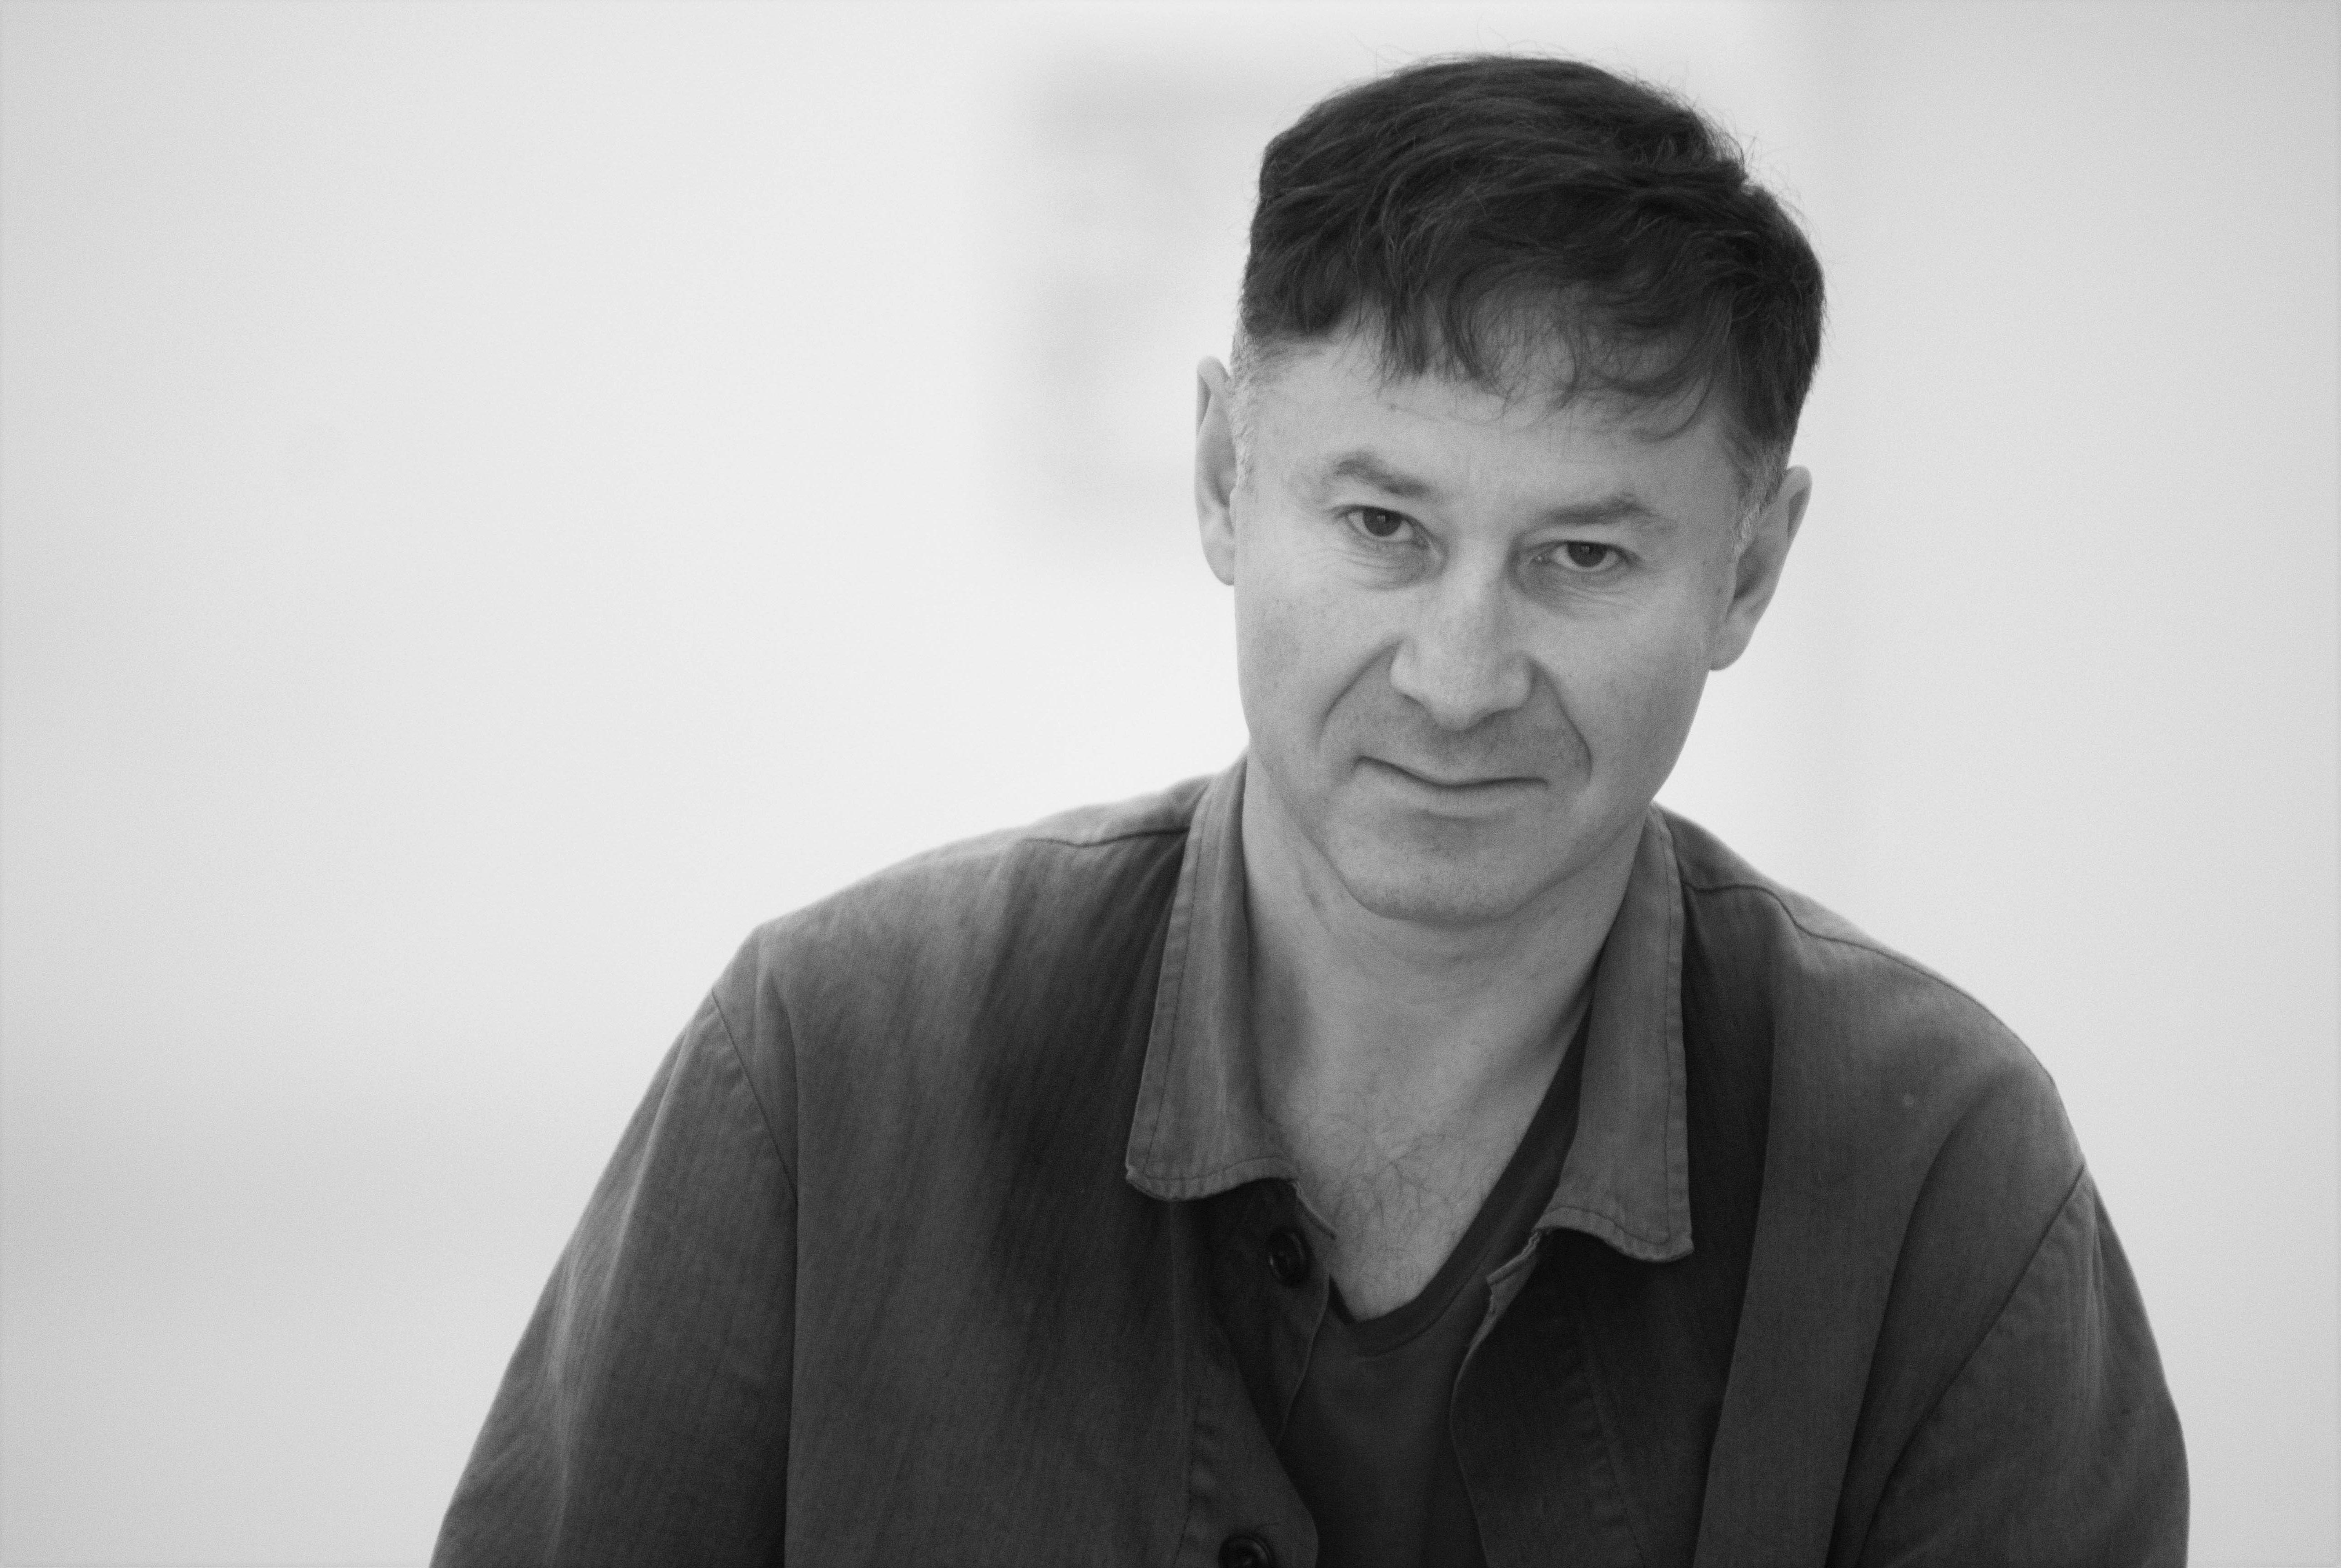 <h1>Геннадий Костров</h1>